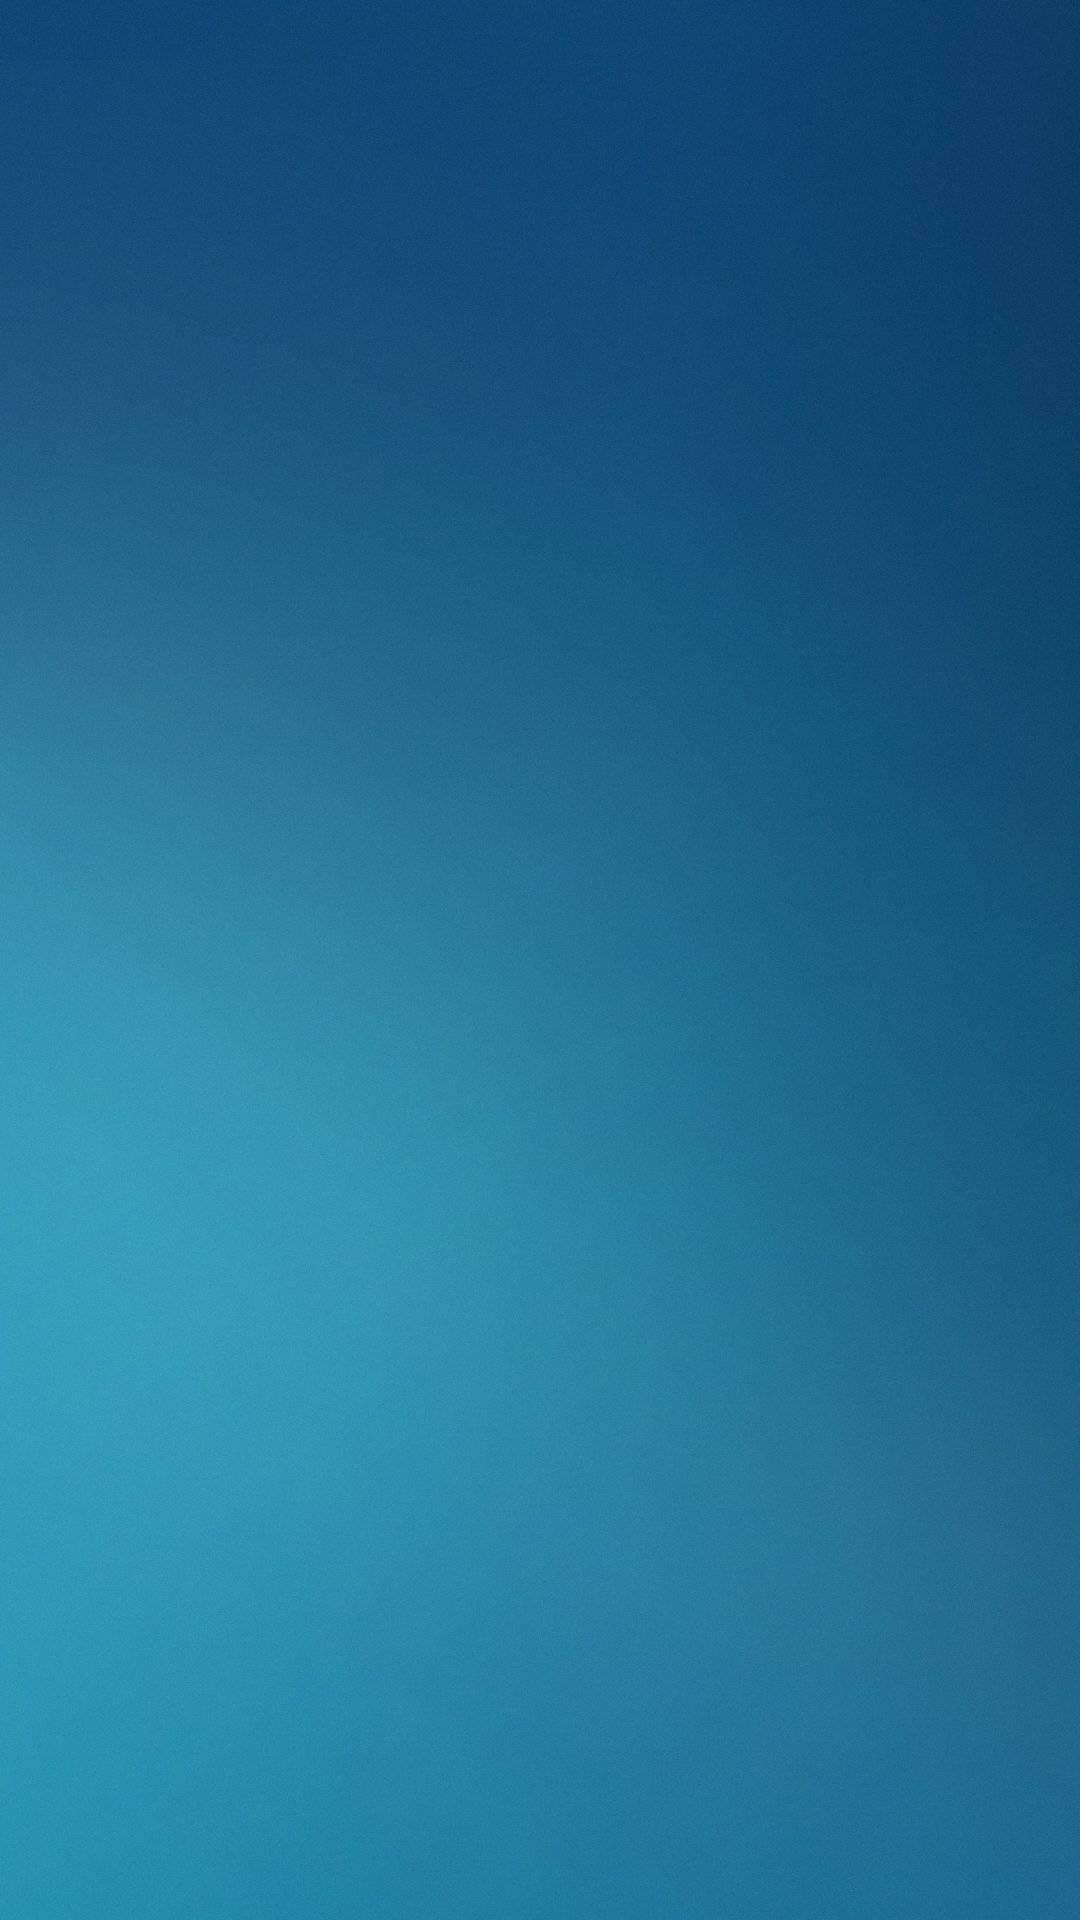 Download 300 Wallpaper Android Hd Xiaomi  Gratis